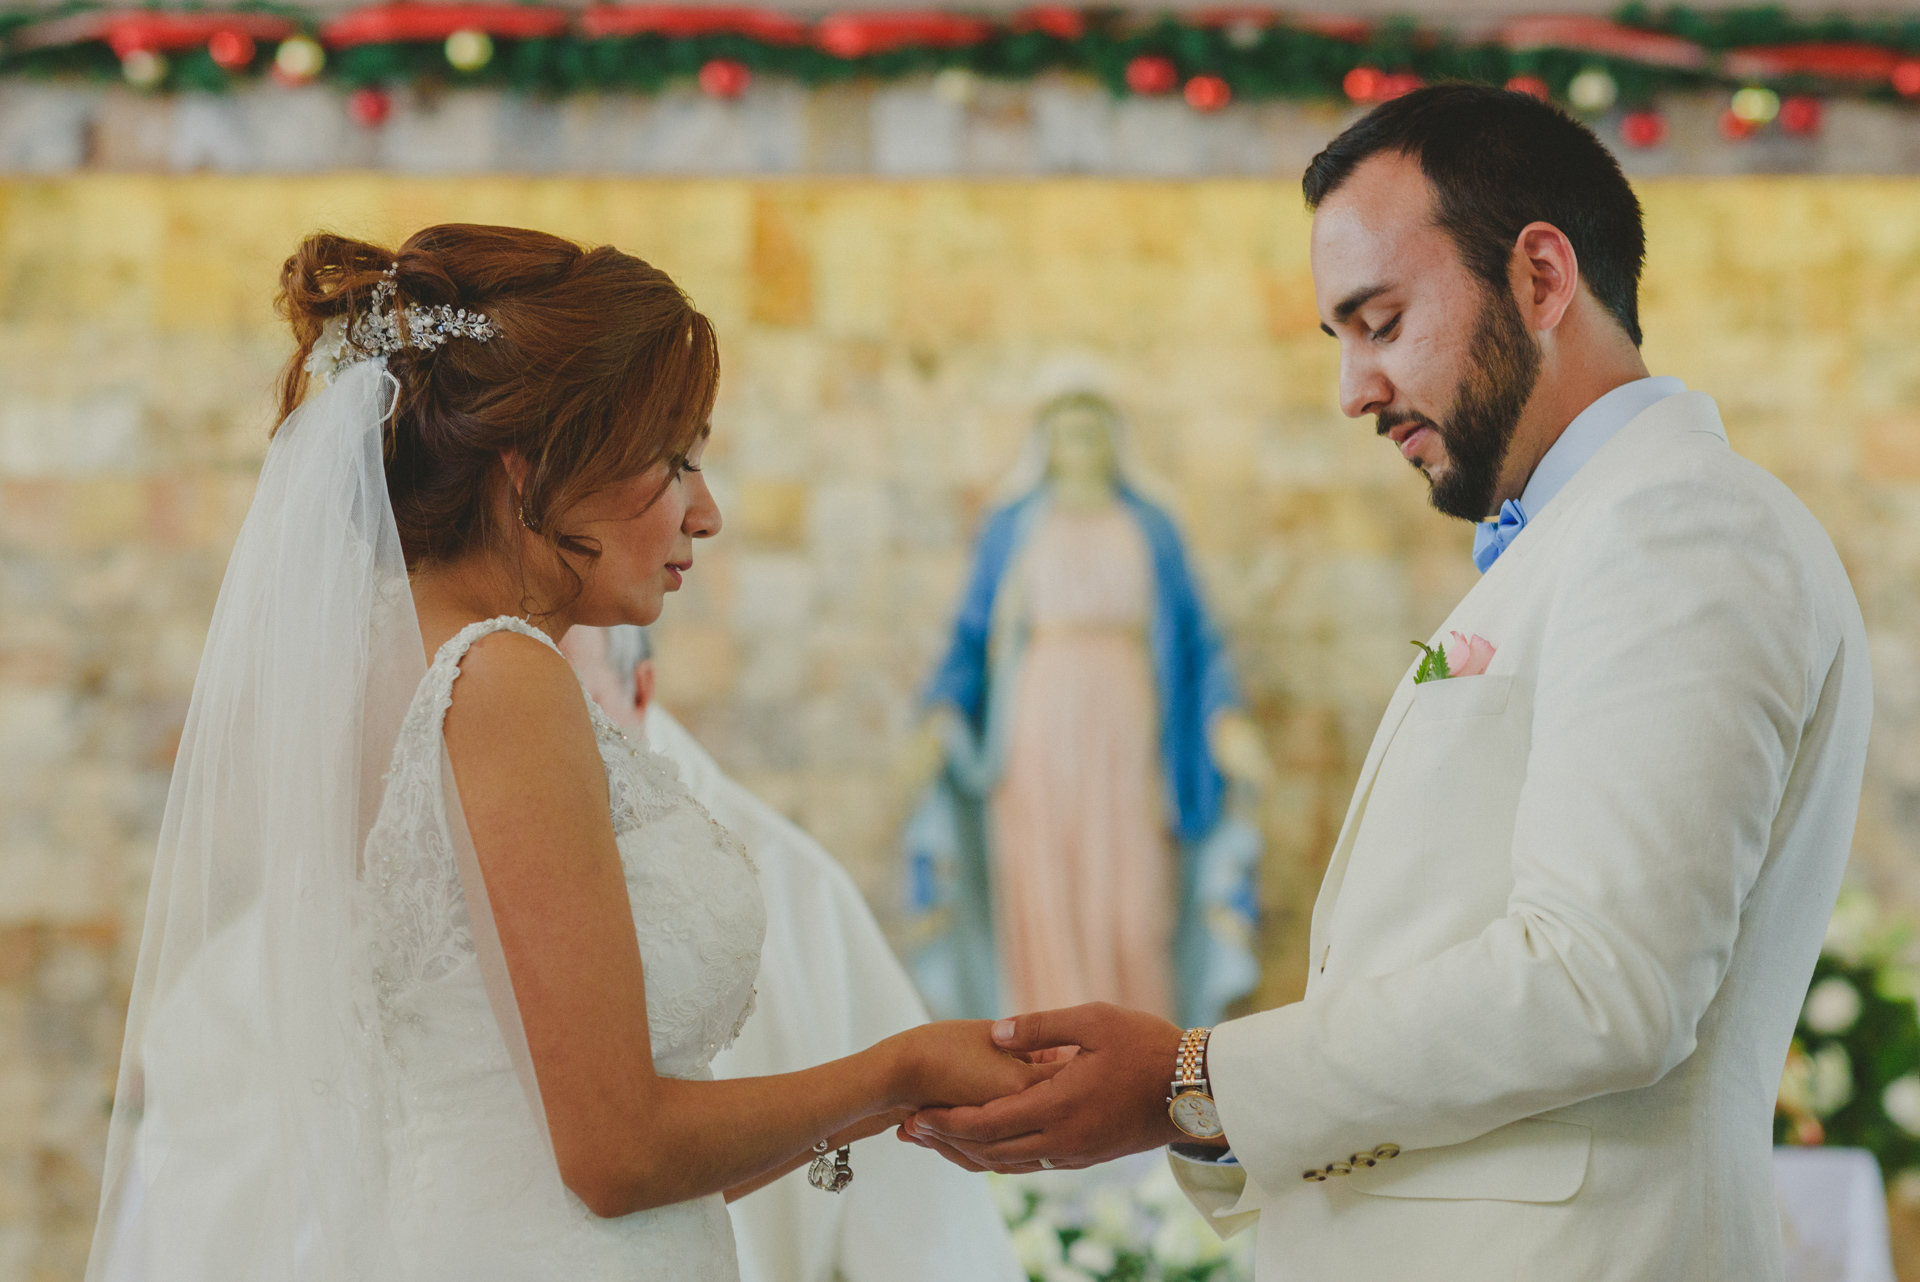 Wedding N&M BLOG luishoudin.com (50 de 174)